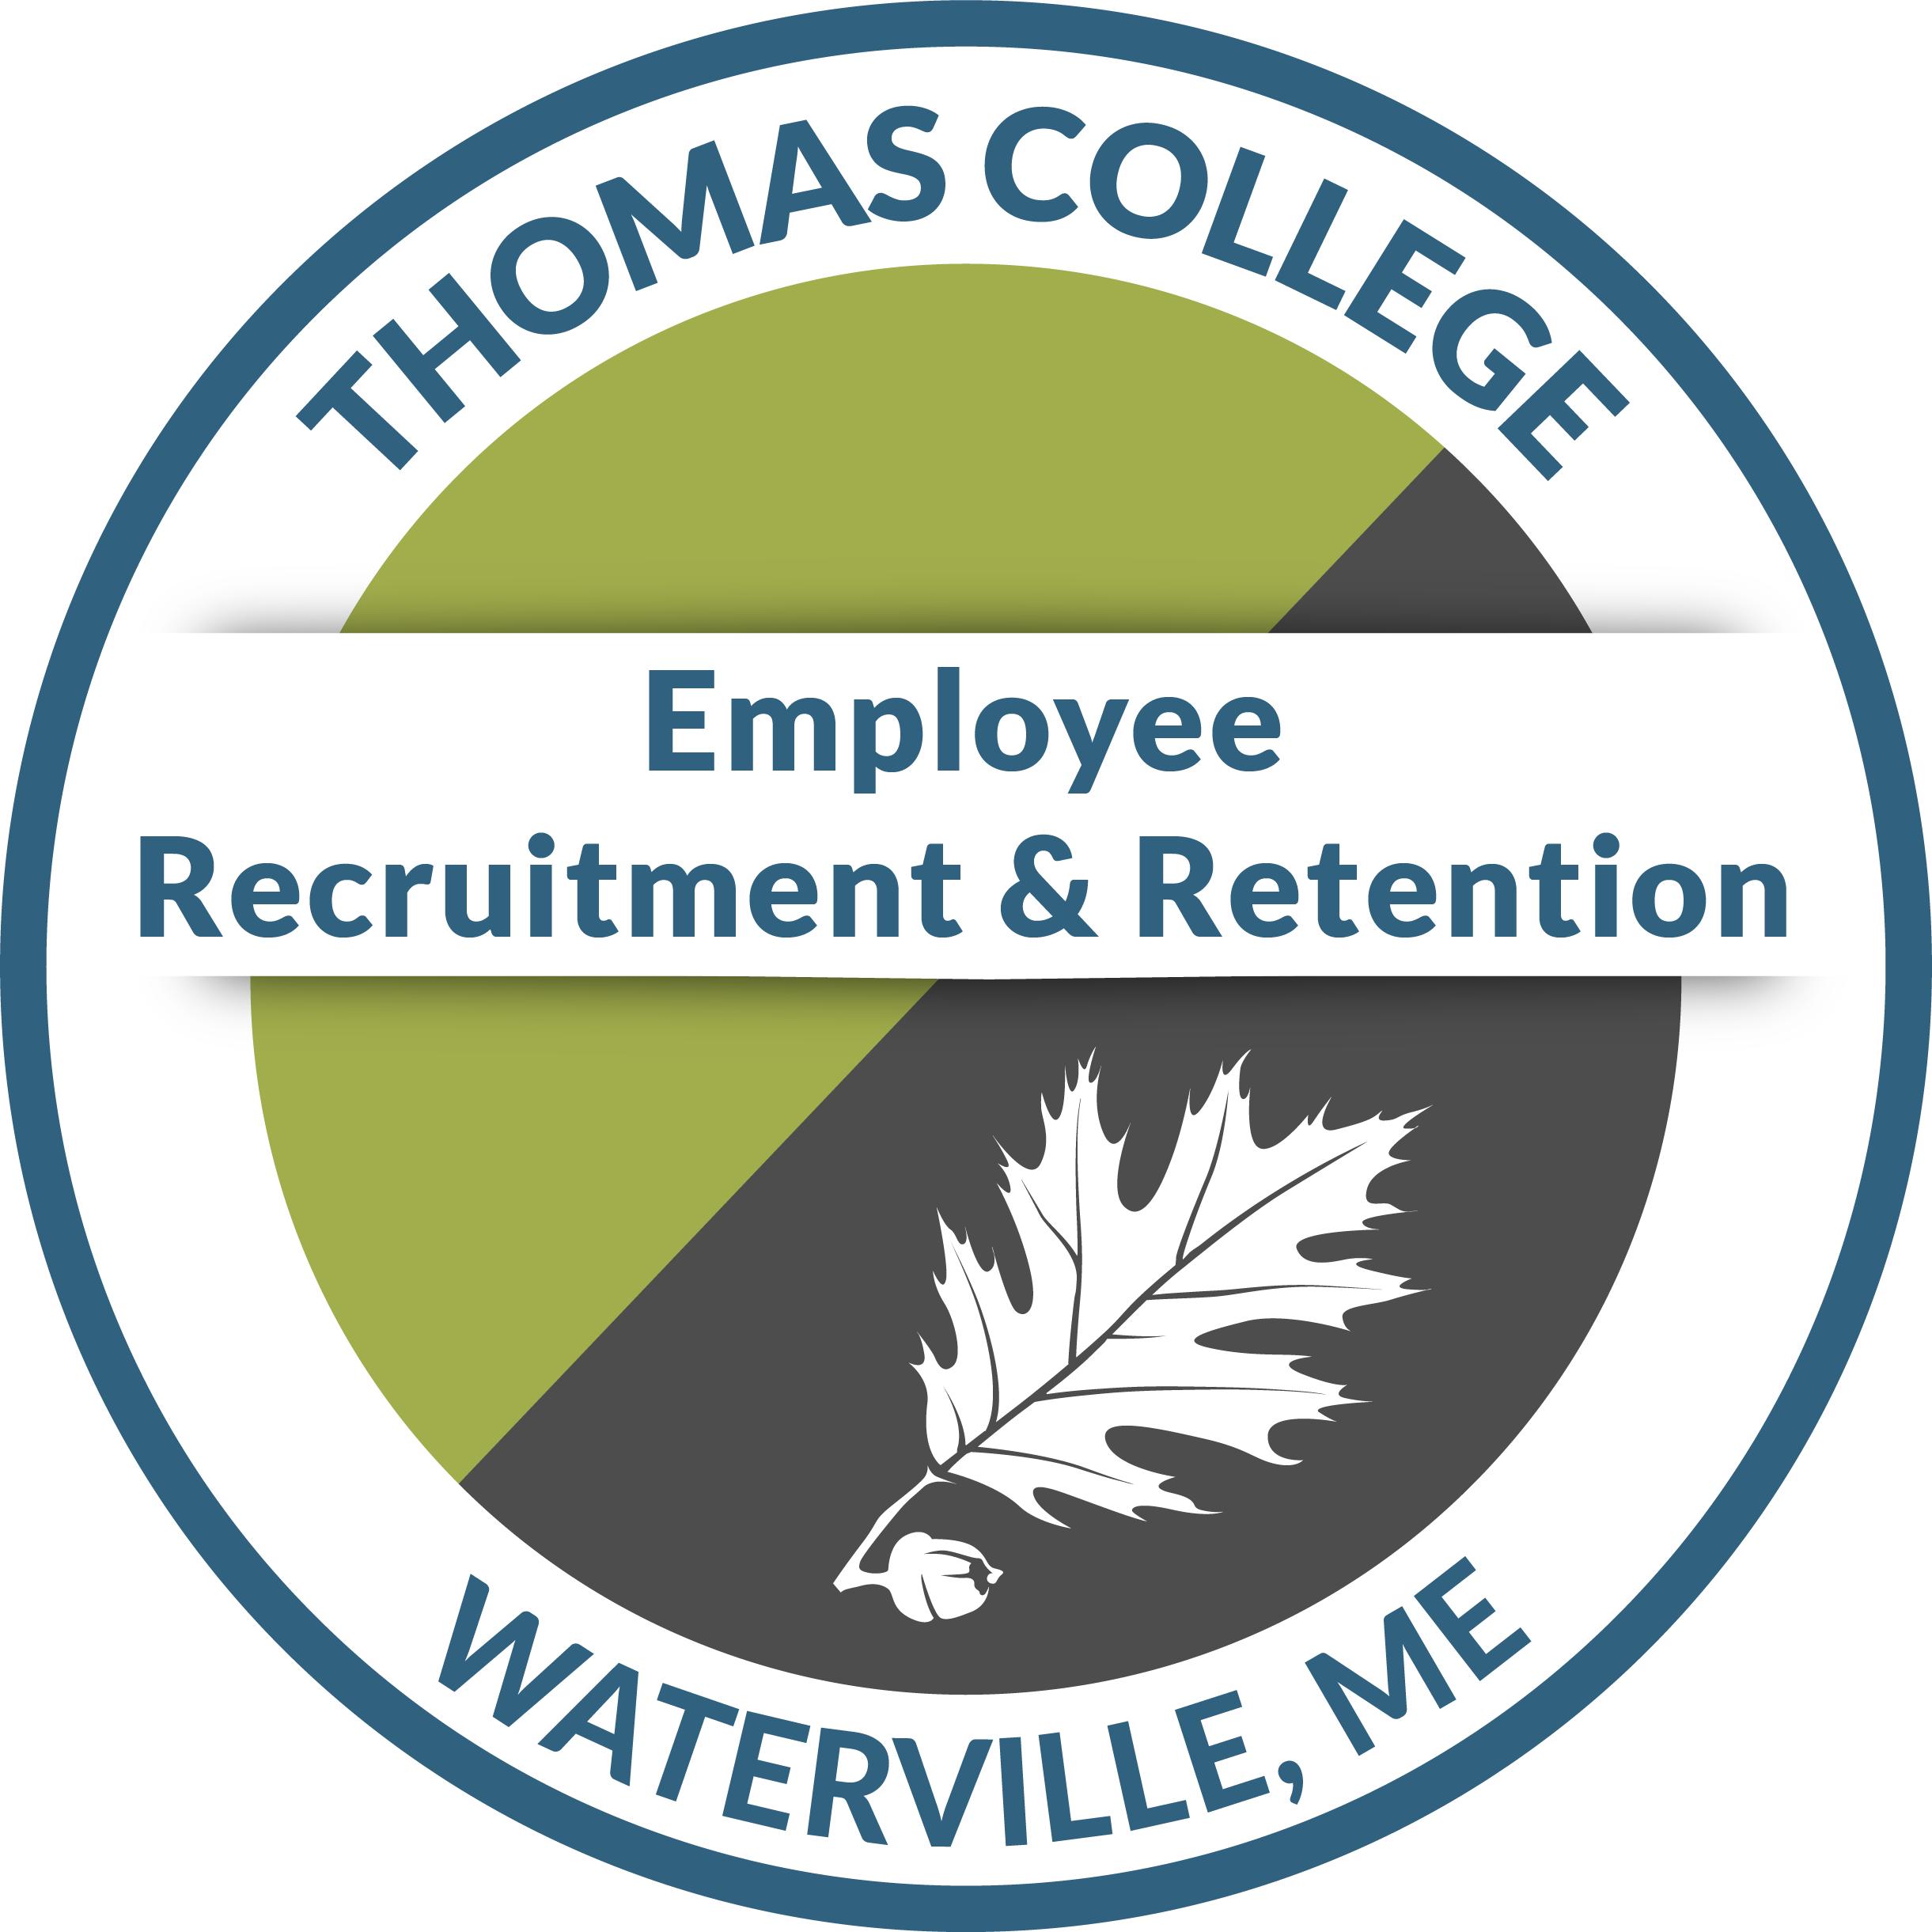 Employee Recruitment & Retention